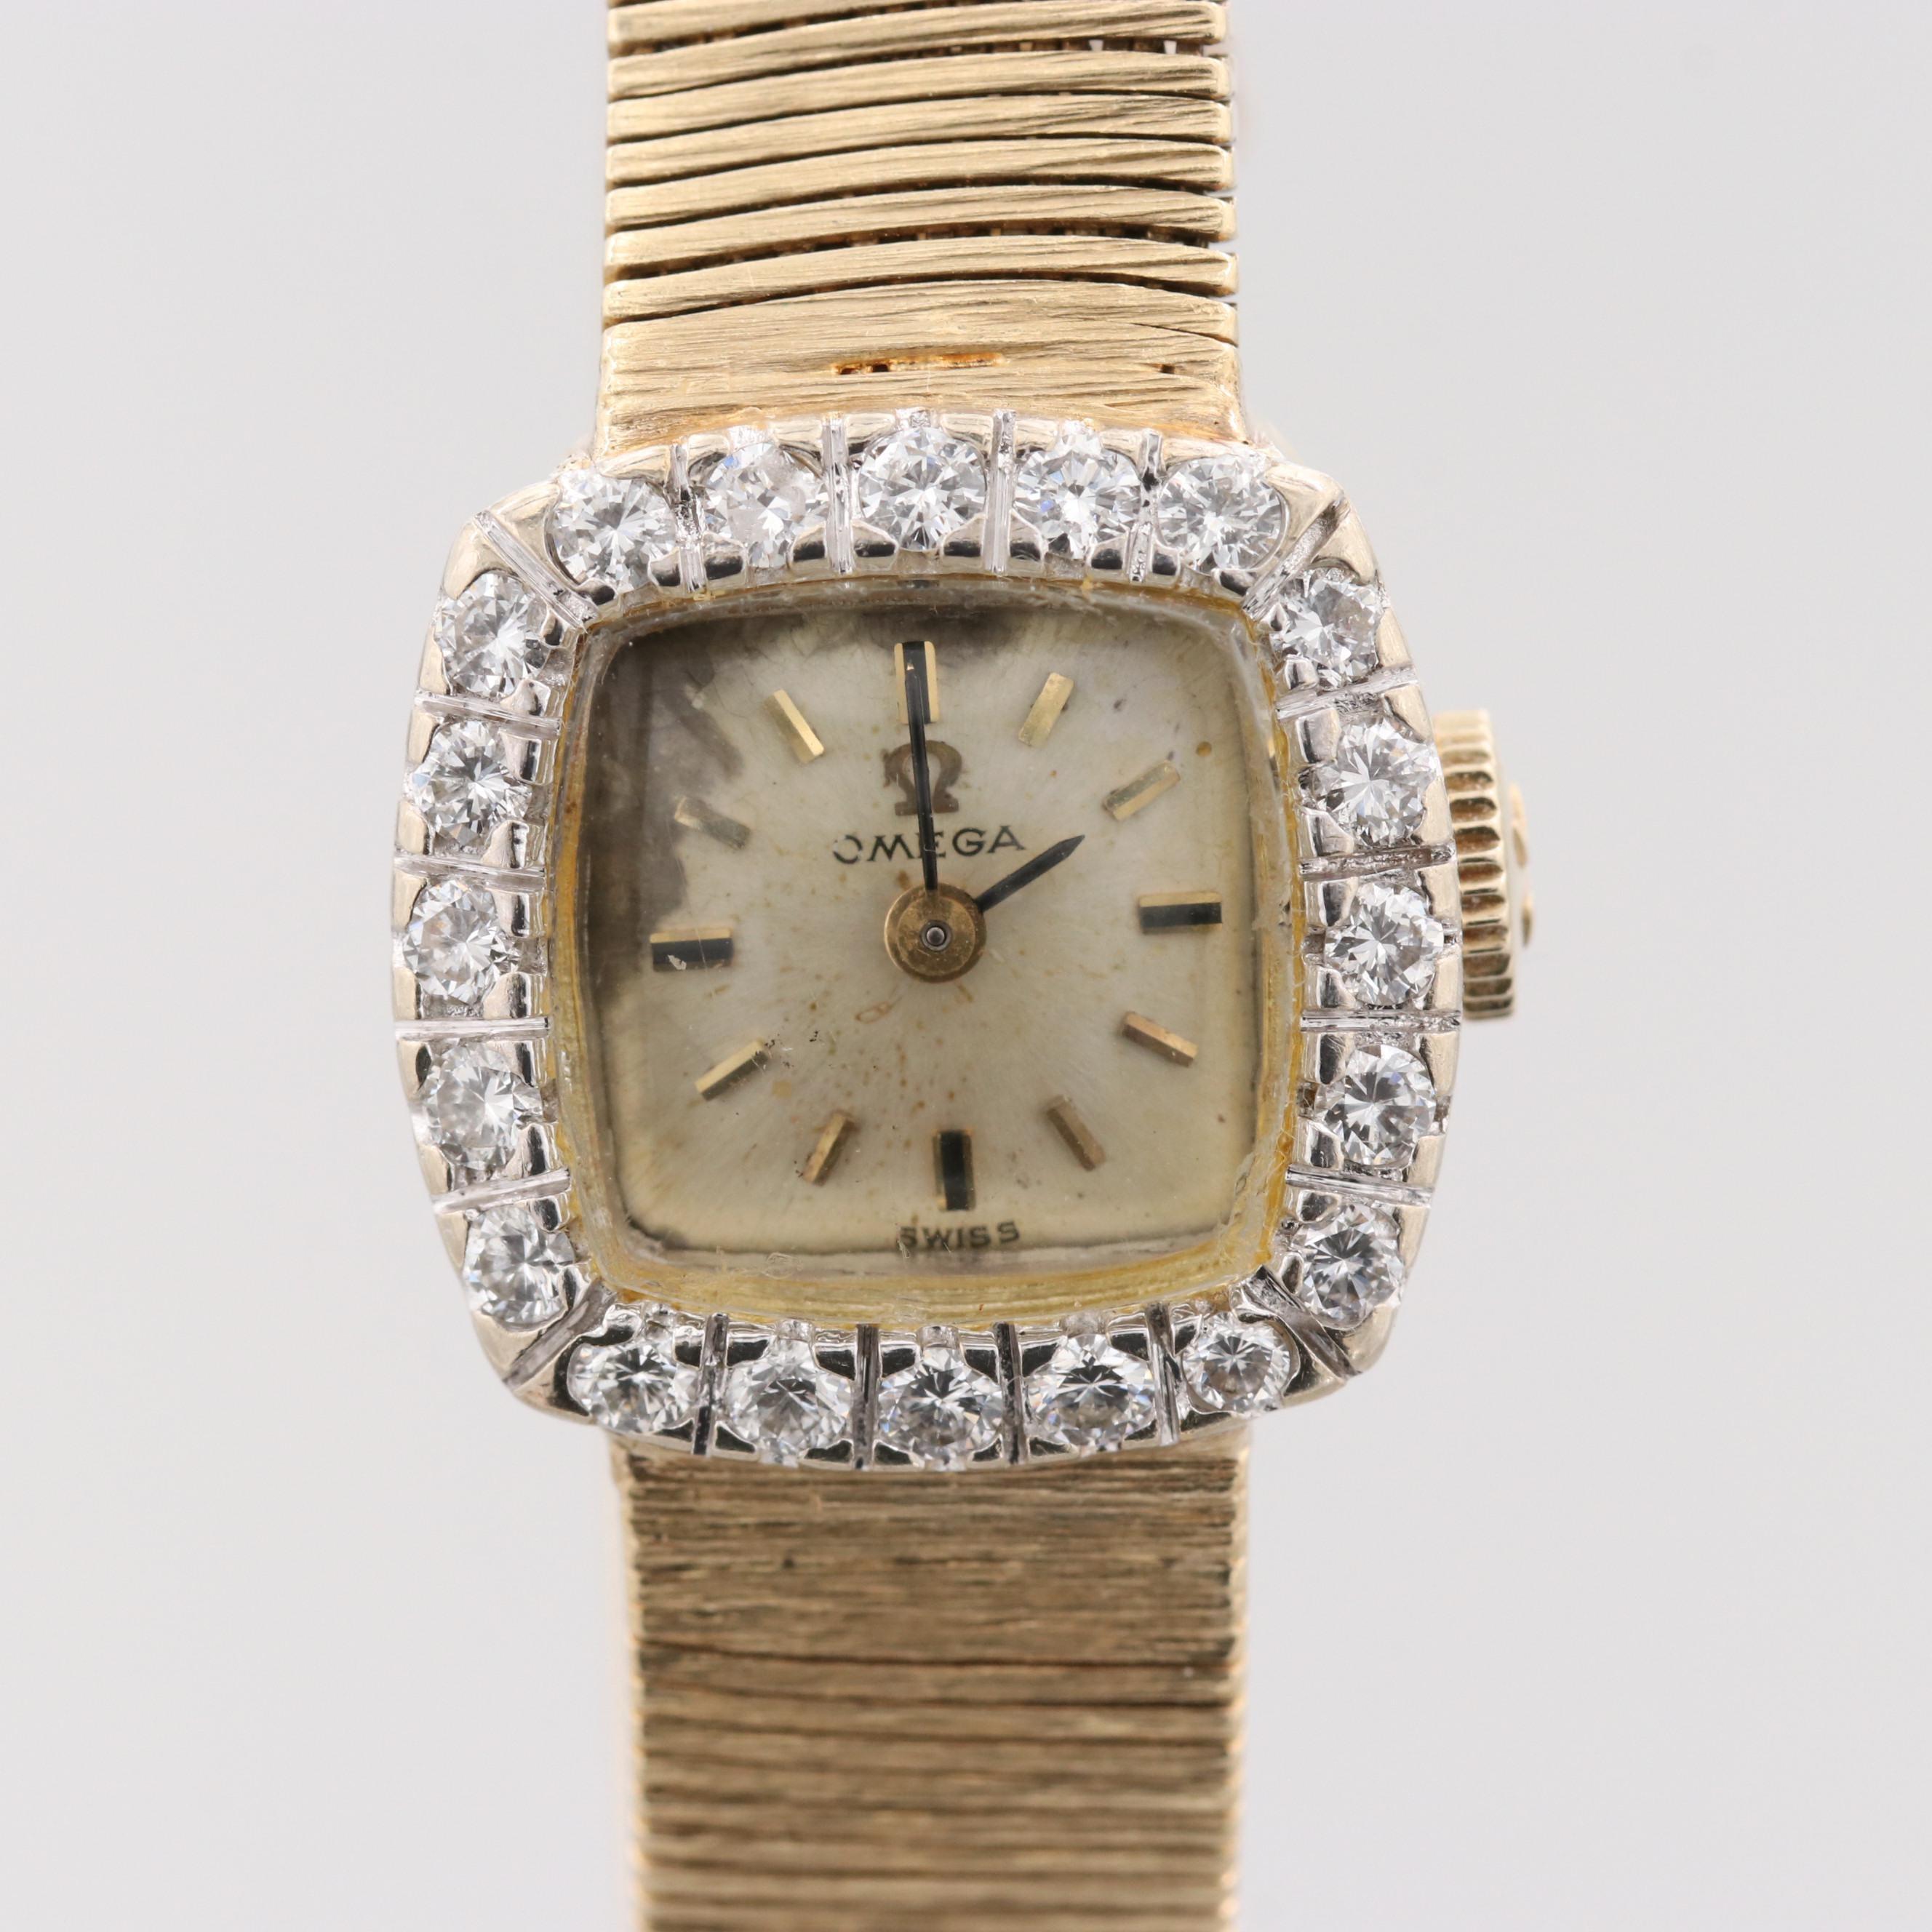 Omega 14K Yellow Gold Wristwatch With Diamond Bezel